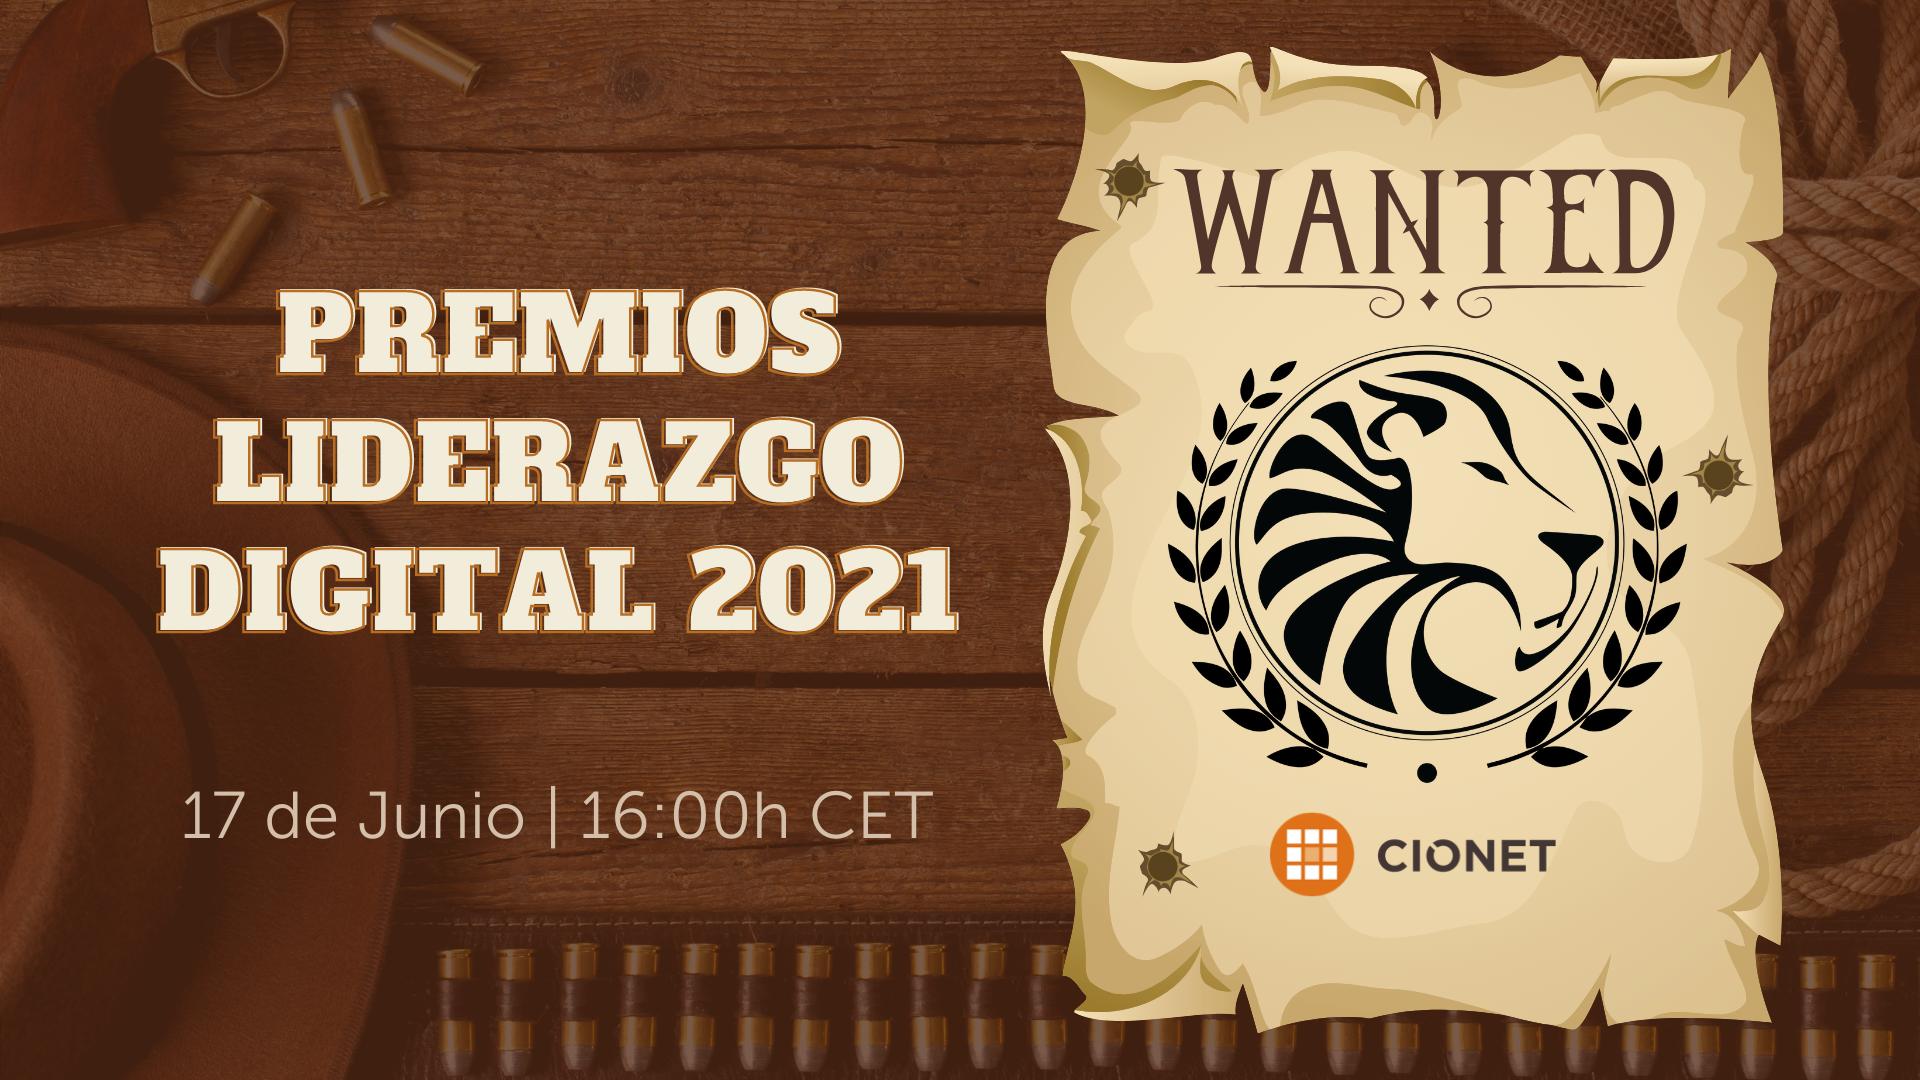 Premios Liderazgo Digital 2021 (1)